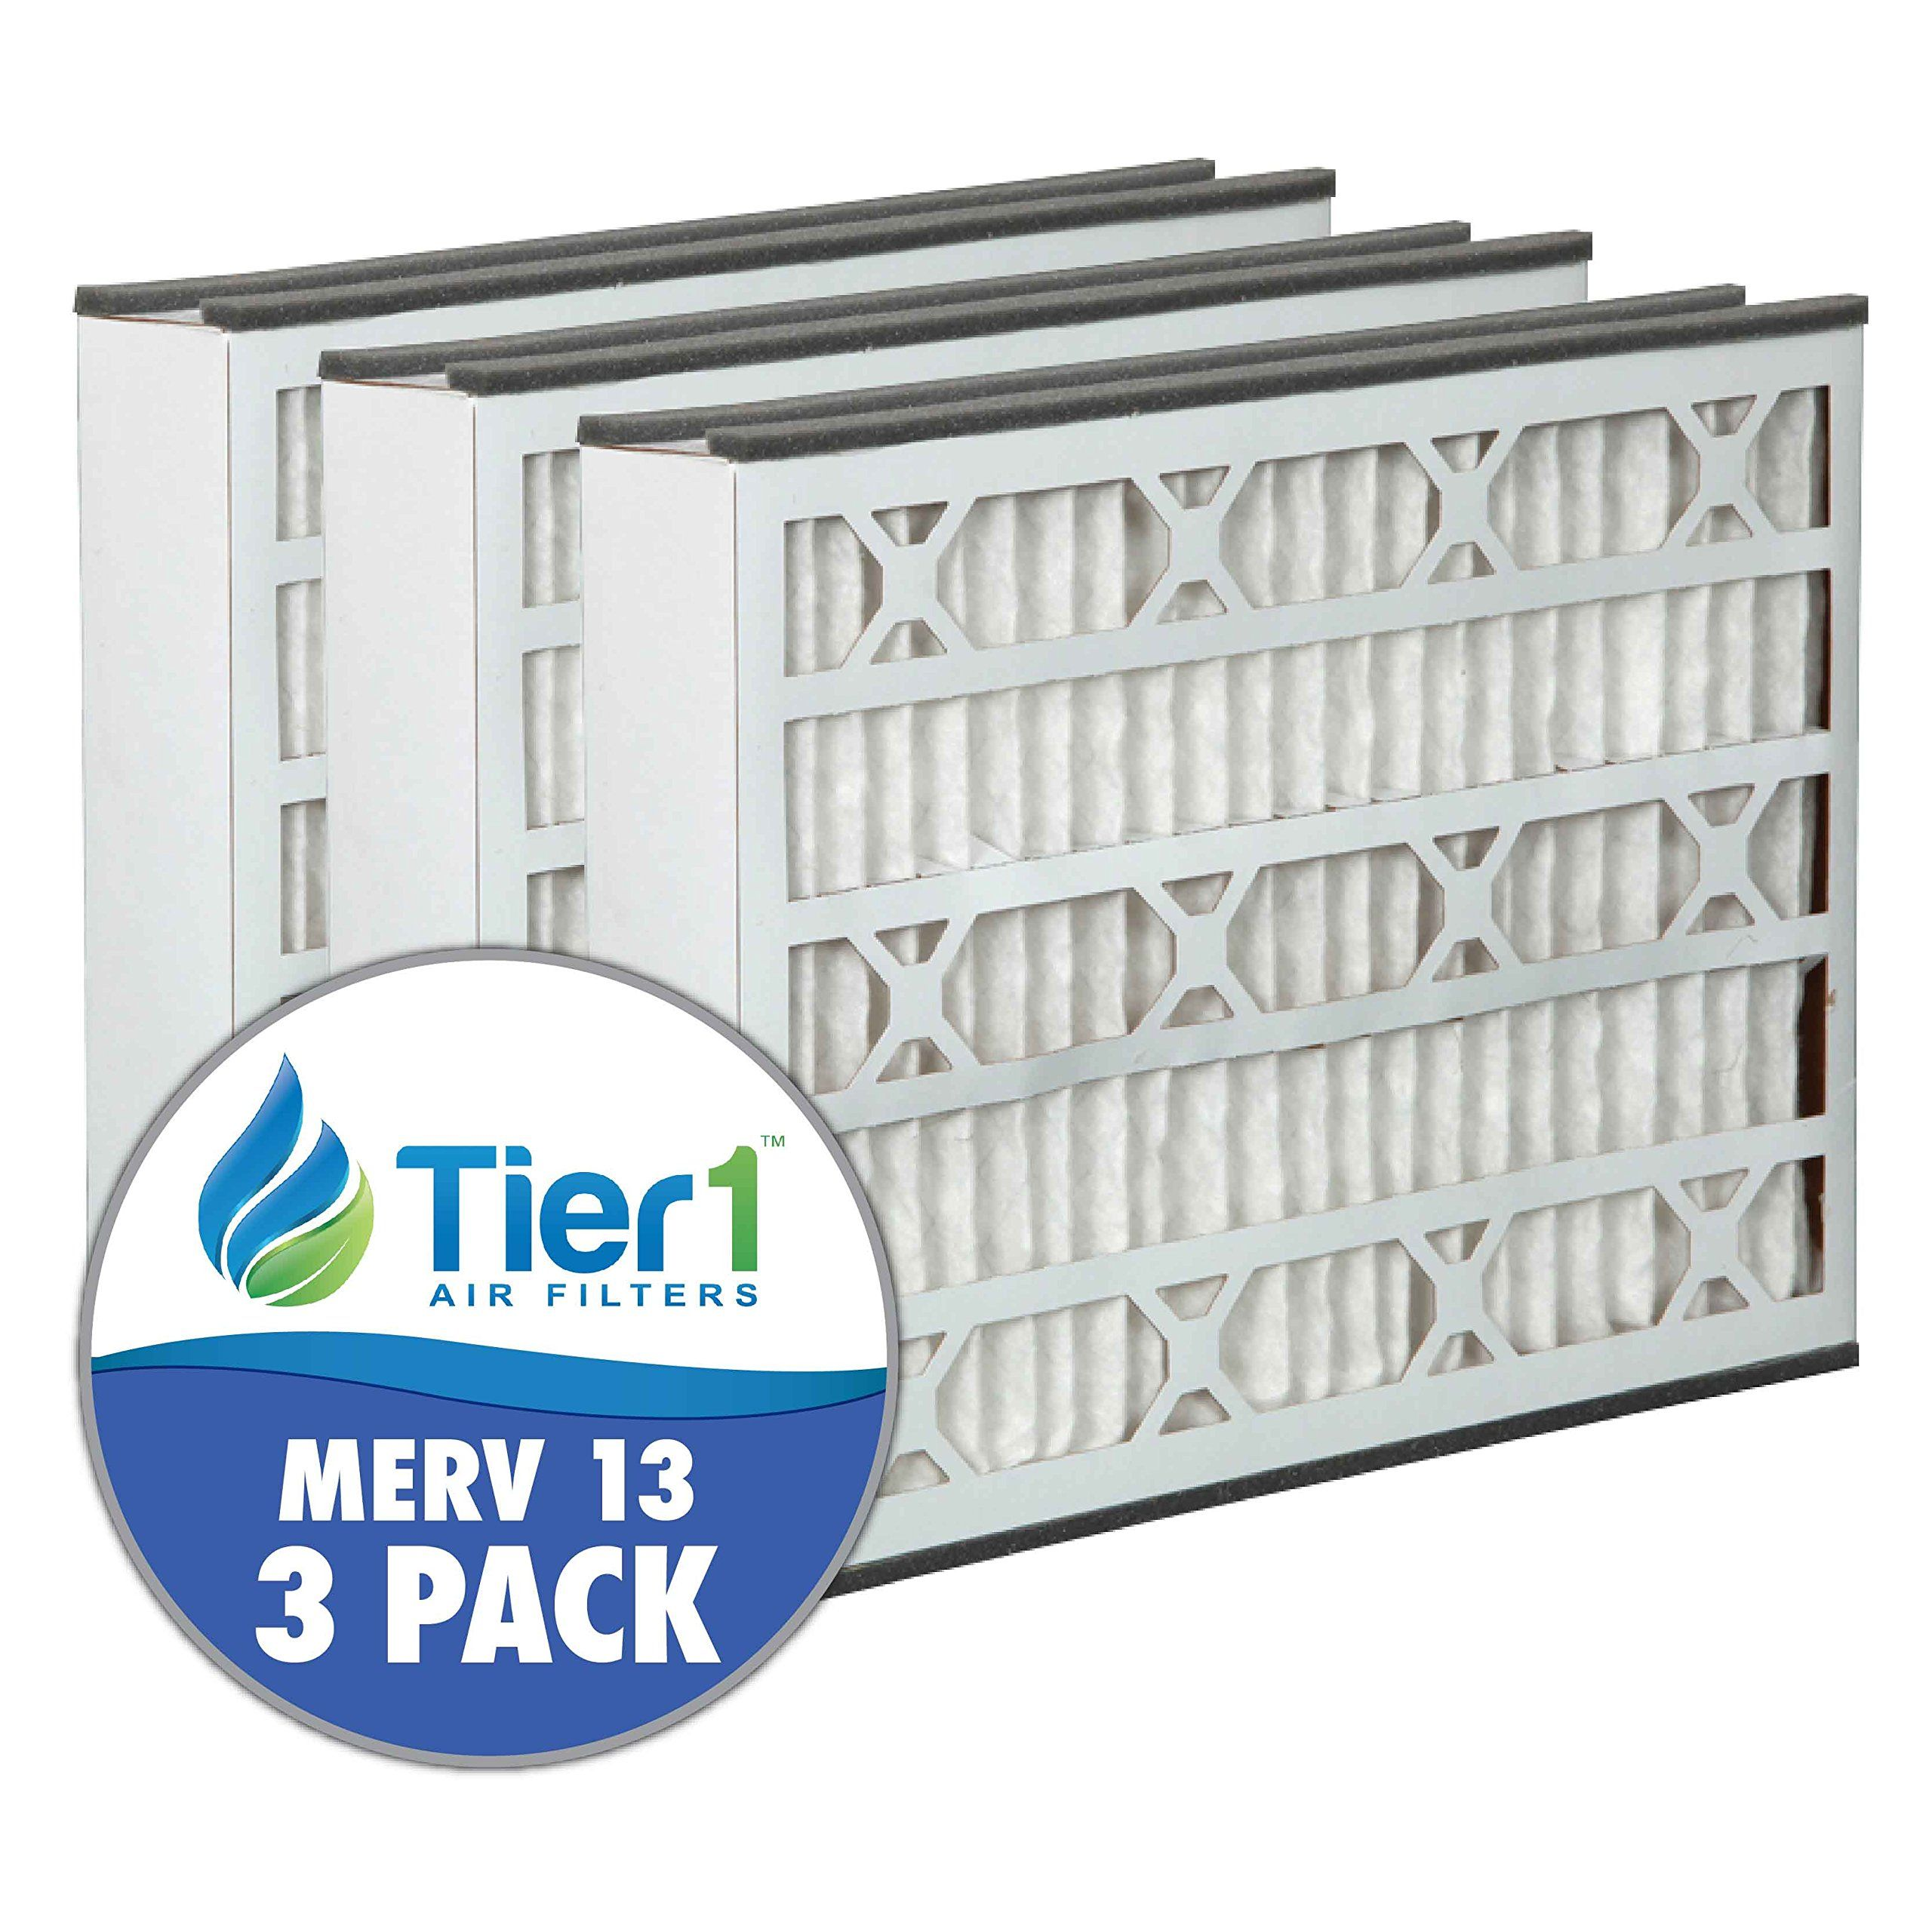 GeneralAire 14164 HouseAirPurifier Air purifier reviews